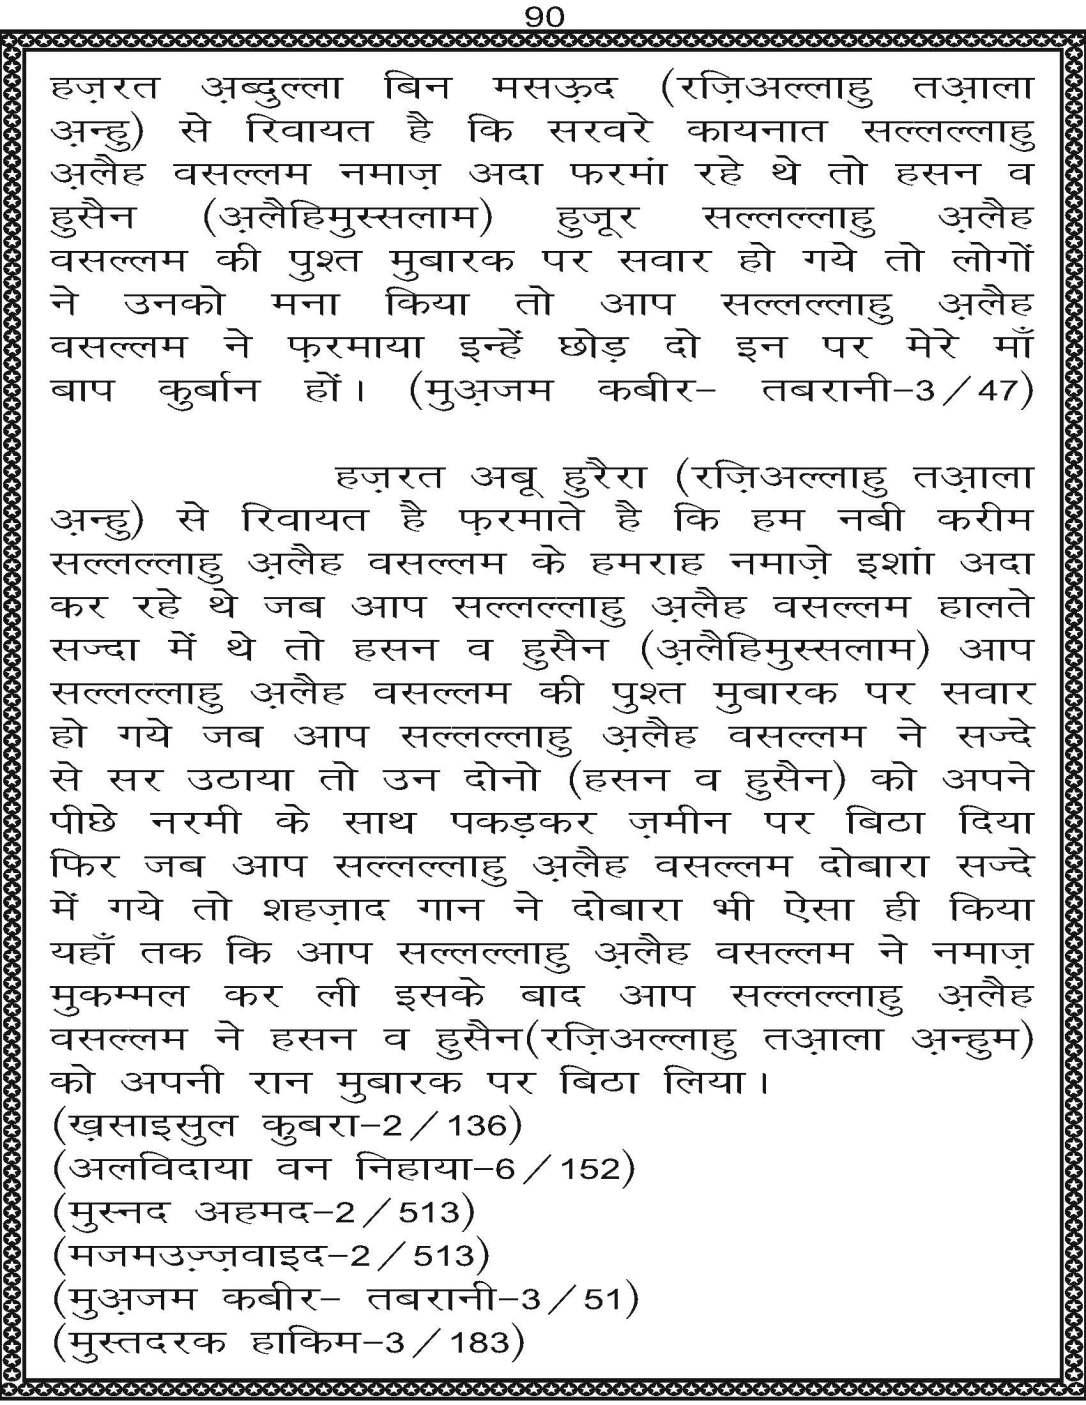 AzmateTaziyadari_Page_090